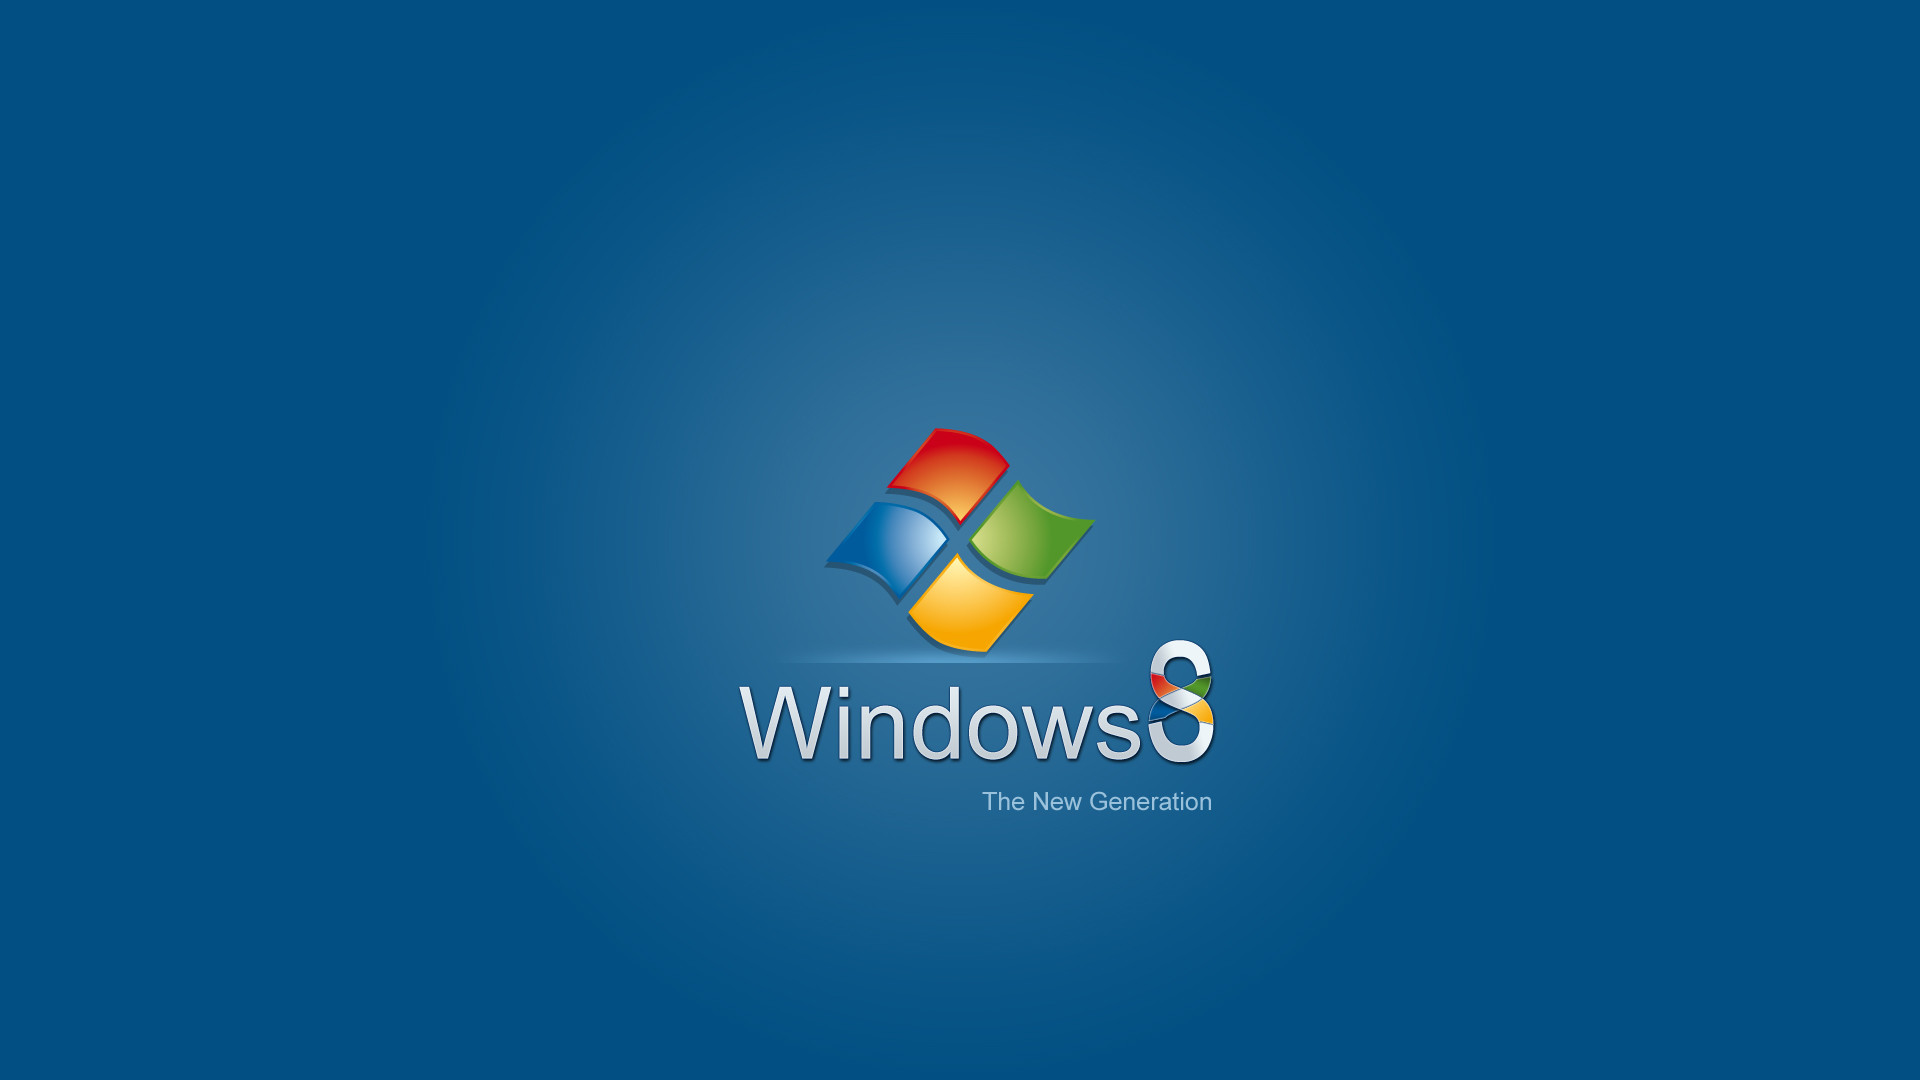 Microsoft Windows Xp Screensavers Free Download : Free hd windows 8  wallpaper wallpapersafari